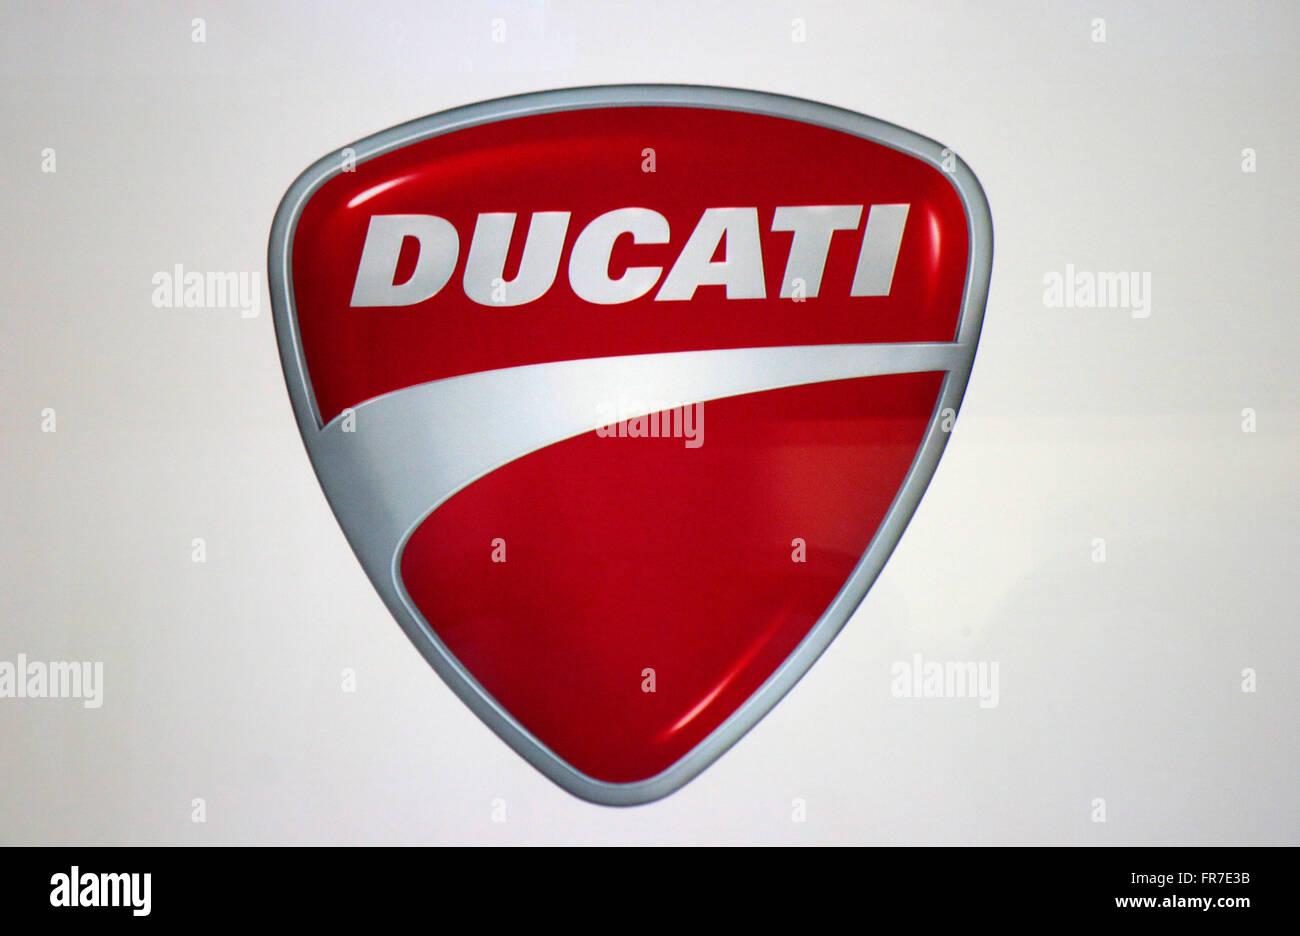 das Logo der Marke 'Ducati', Berlin. - Stock Image